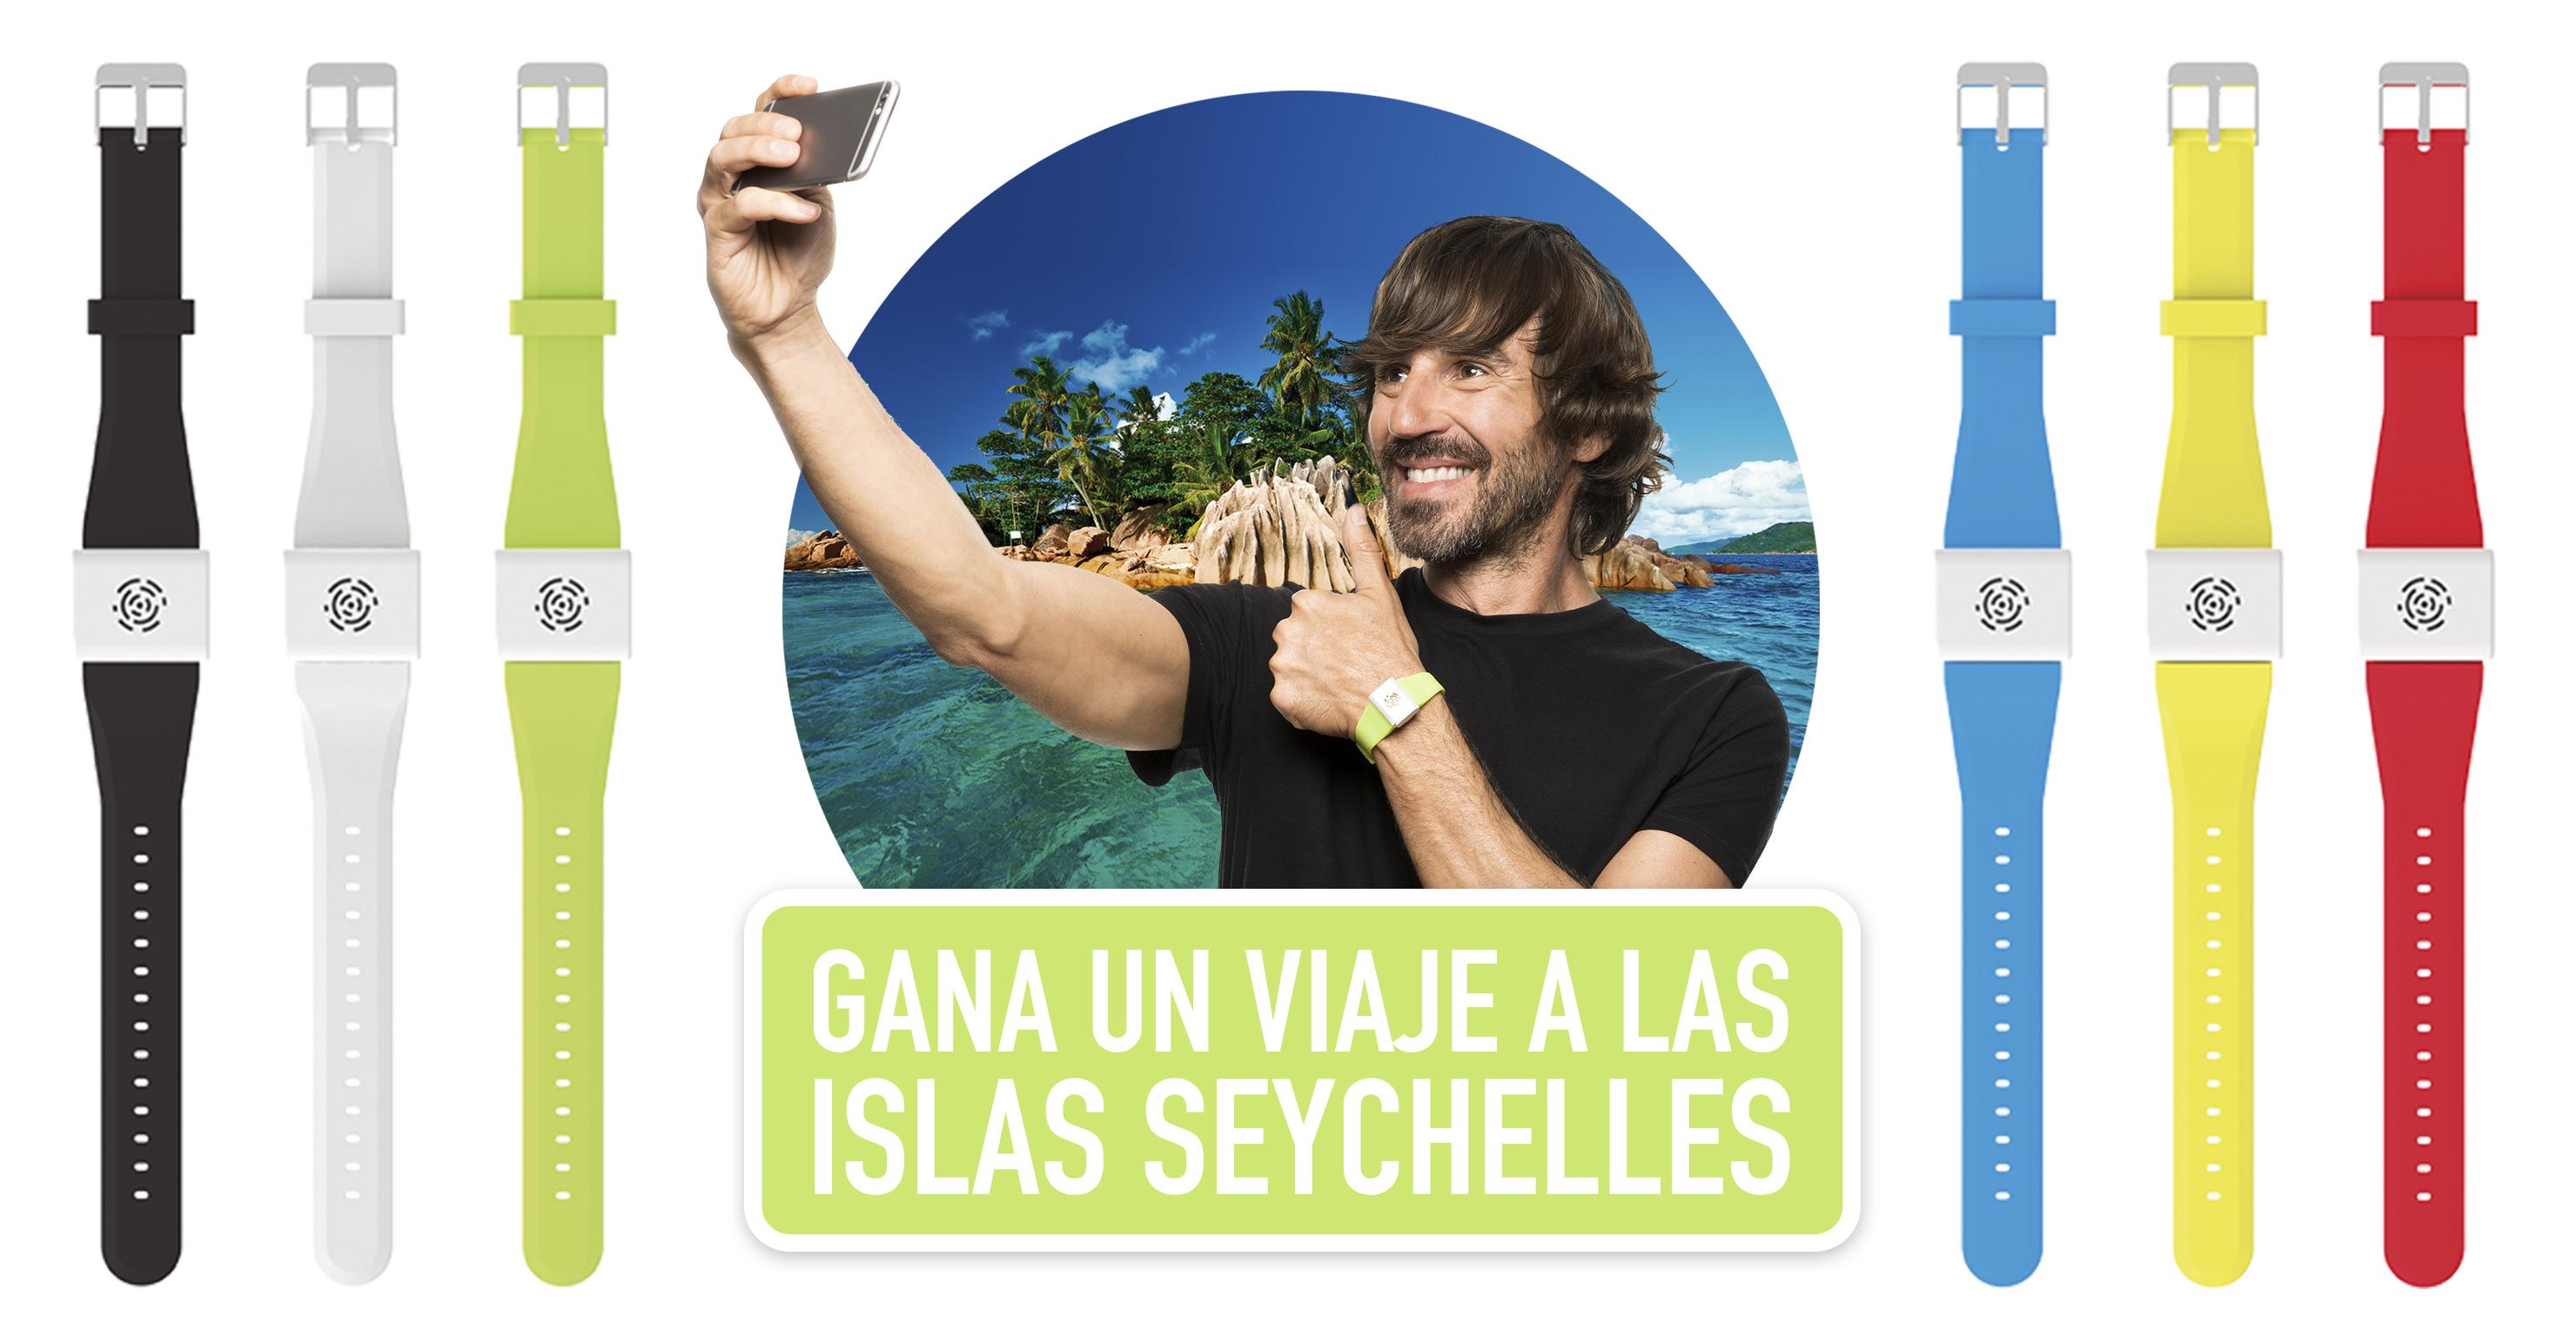 Campaña Radarcan Viaja sin mosquitos Santi Millán